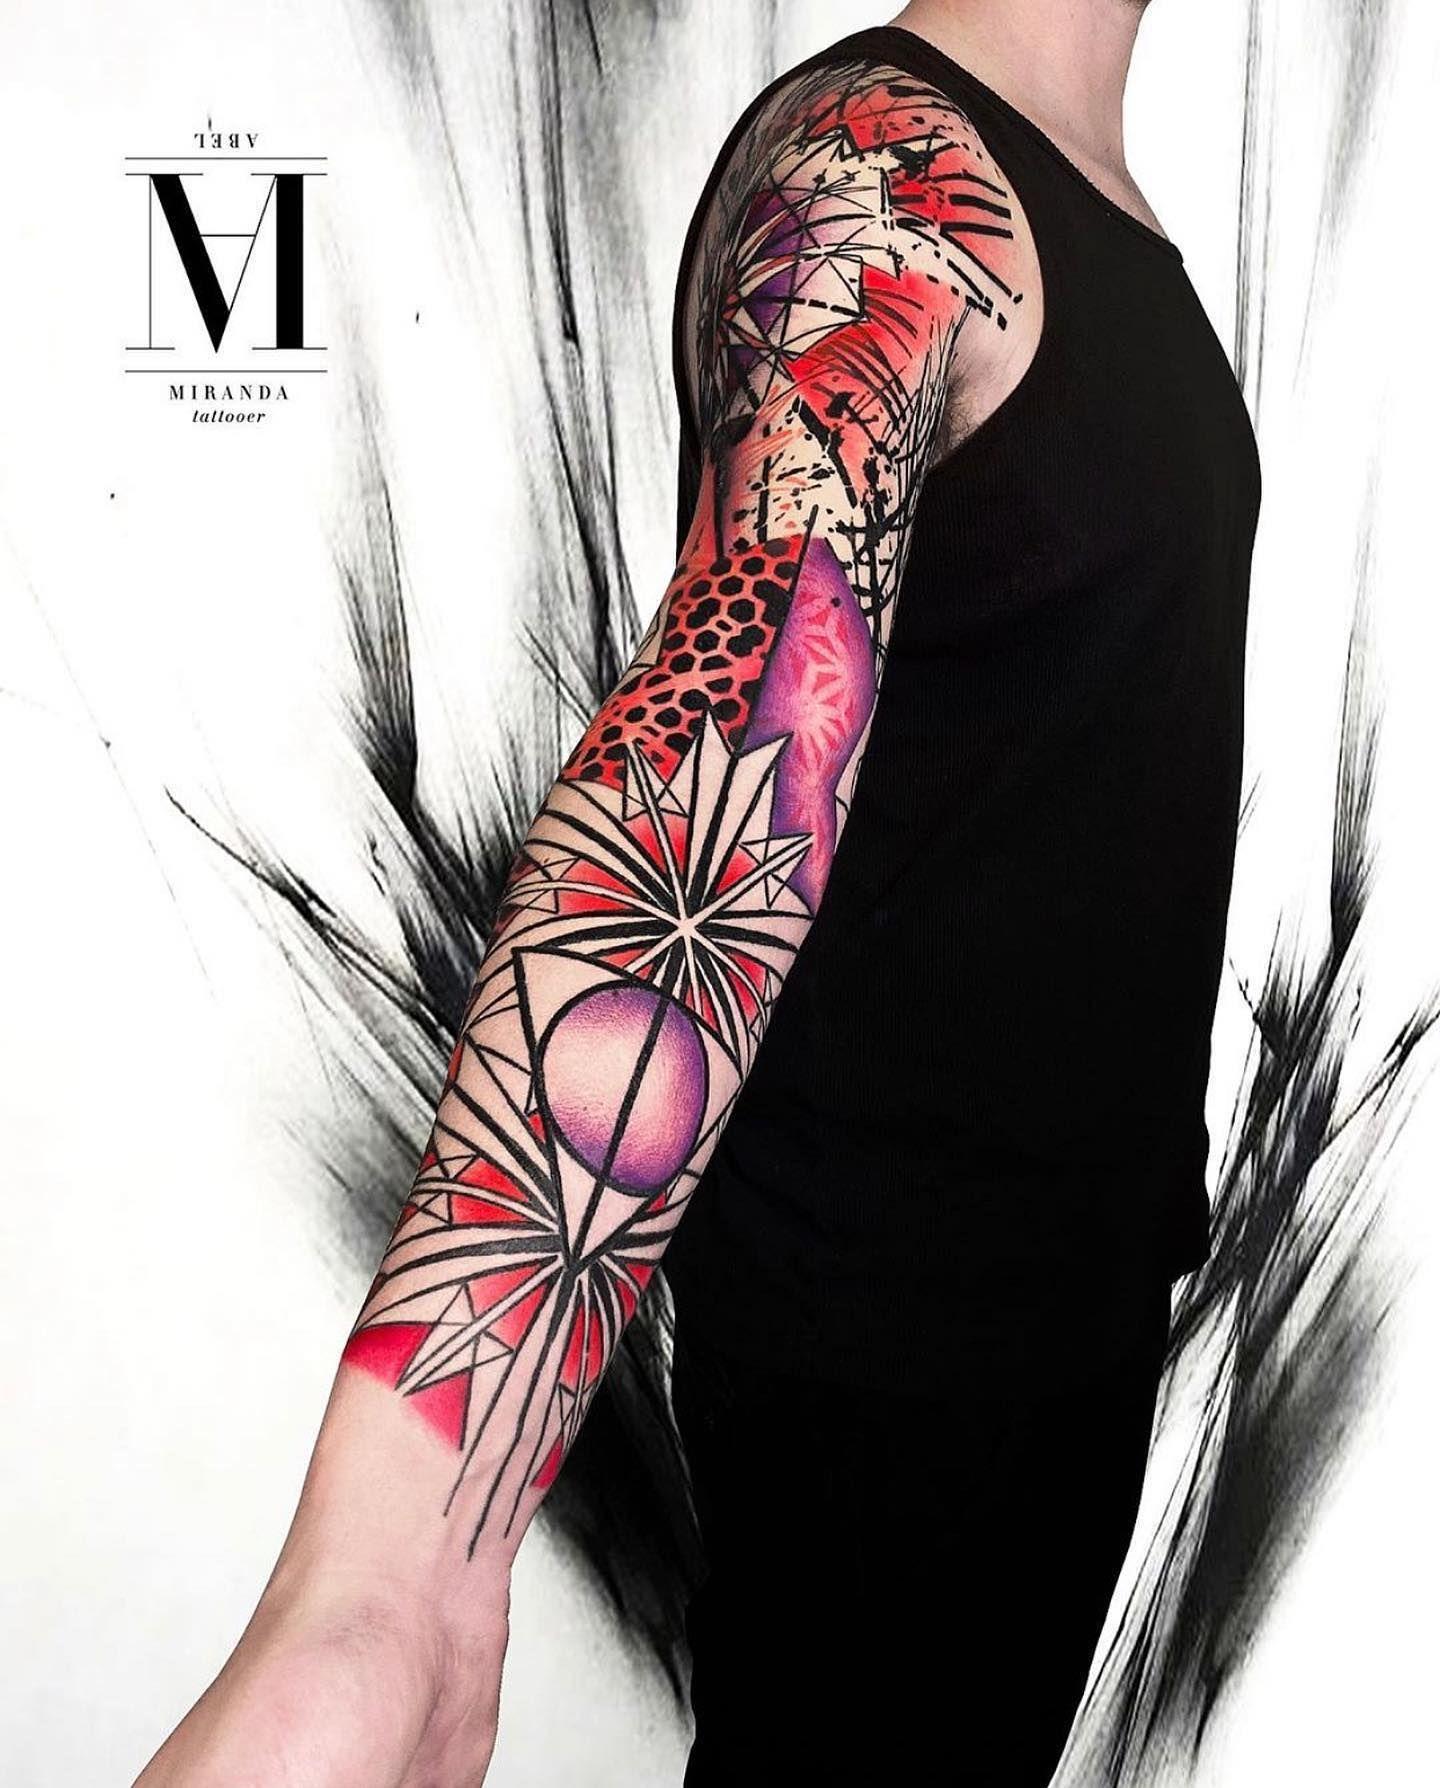 🖤 ....geometric Avantgarde ... Abstract concept....chaos and textures by @abelmiranda_tattoo .... 👇Para reservas y consultas / To book an appointment 👇 📱 +34 658 107 607 ☎ +34 930 247 011 📧avantgardetattoocollective@gmail.com ➖➖➖➖➖➖➖➖➖➖➖ #tattoo #tatuaje #bcntattoo #tattooart #tattoos #tatuajes #ink #barcelonatattoo #inked #tattooink #tattooartist #tattoist #tattooed #arttattoo#tattoospain #tattoolife #asbtracttattoo #avantgardetattoocollective #inkedbcn #colortattoo #abelmirandatattoo